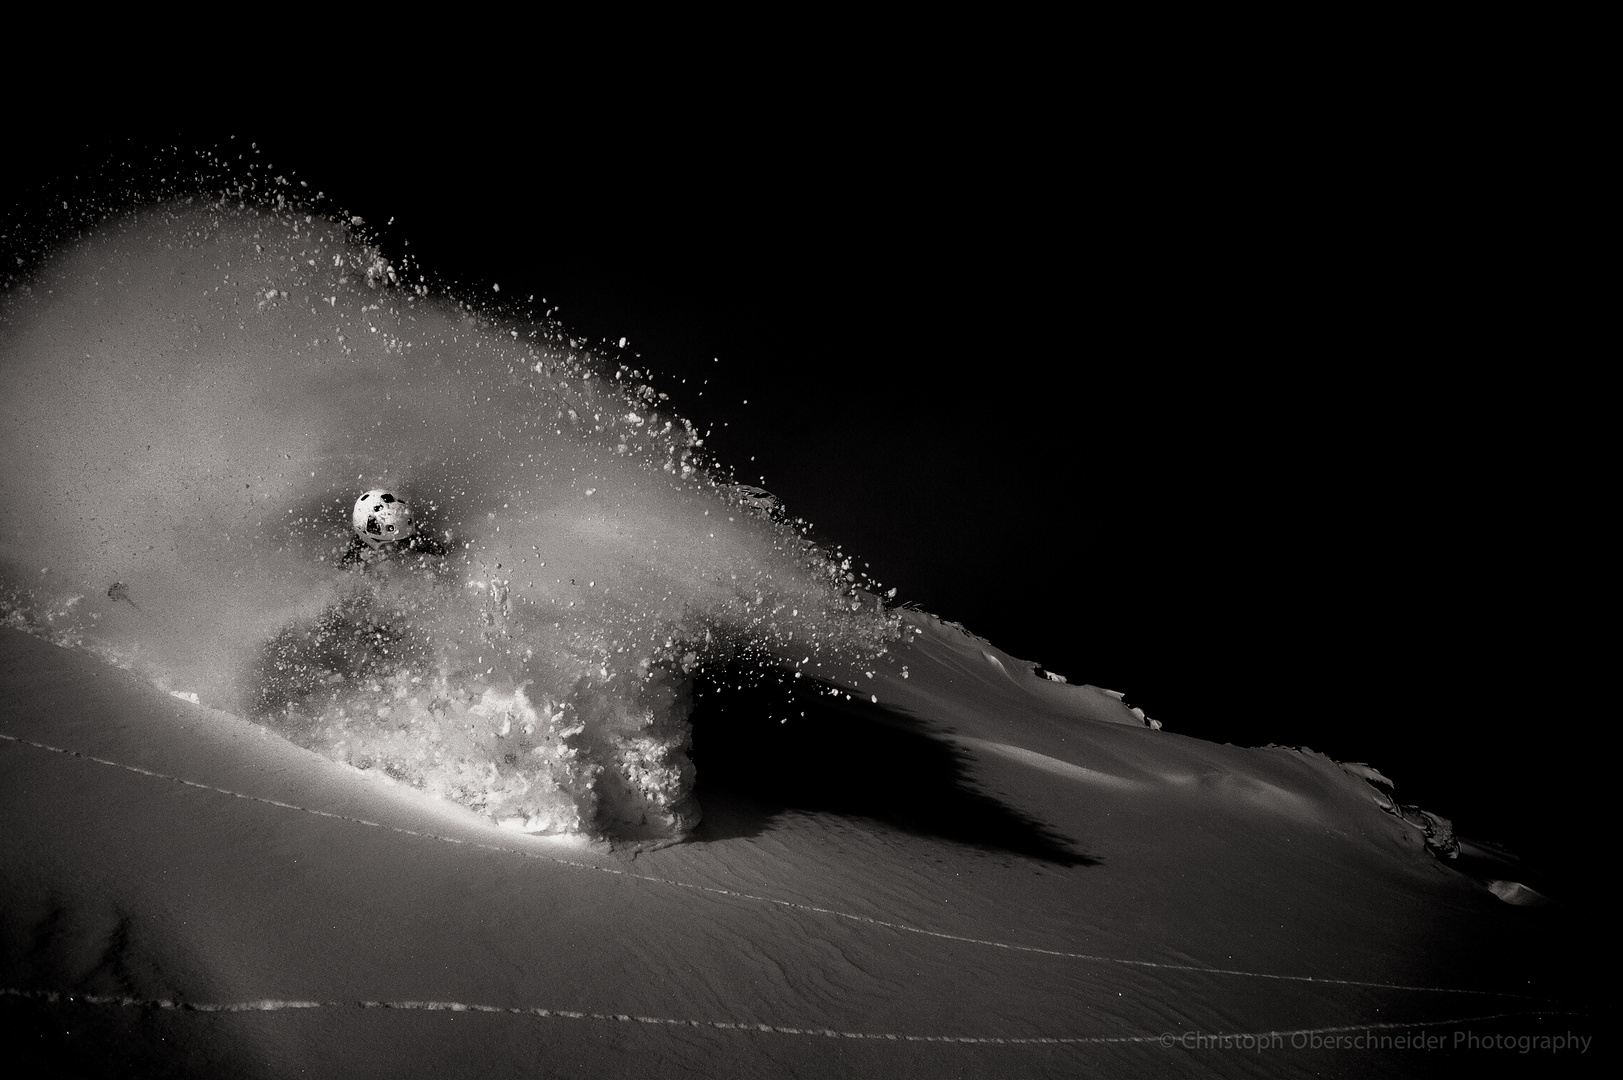 B&W Schnee-Explosion